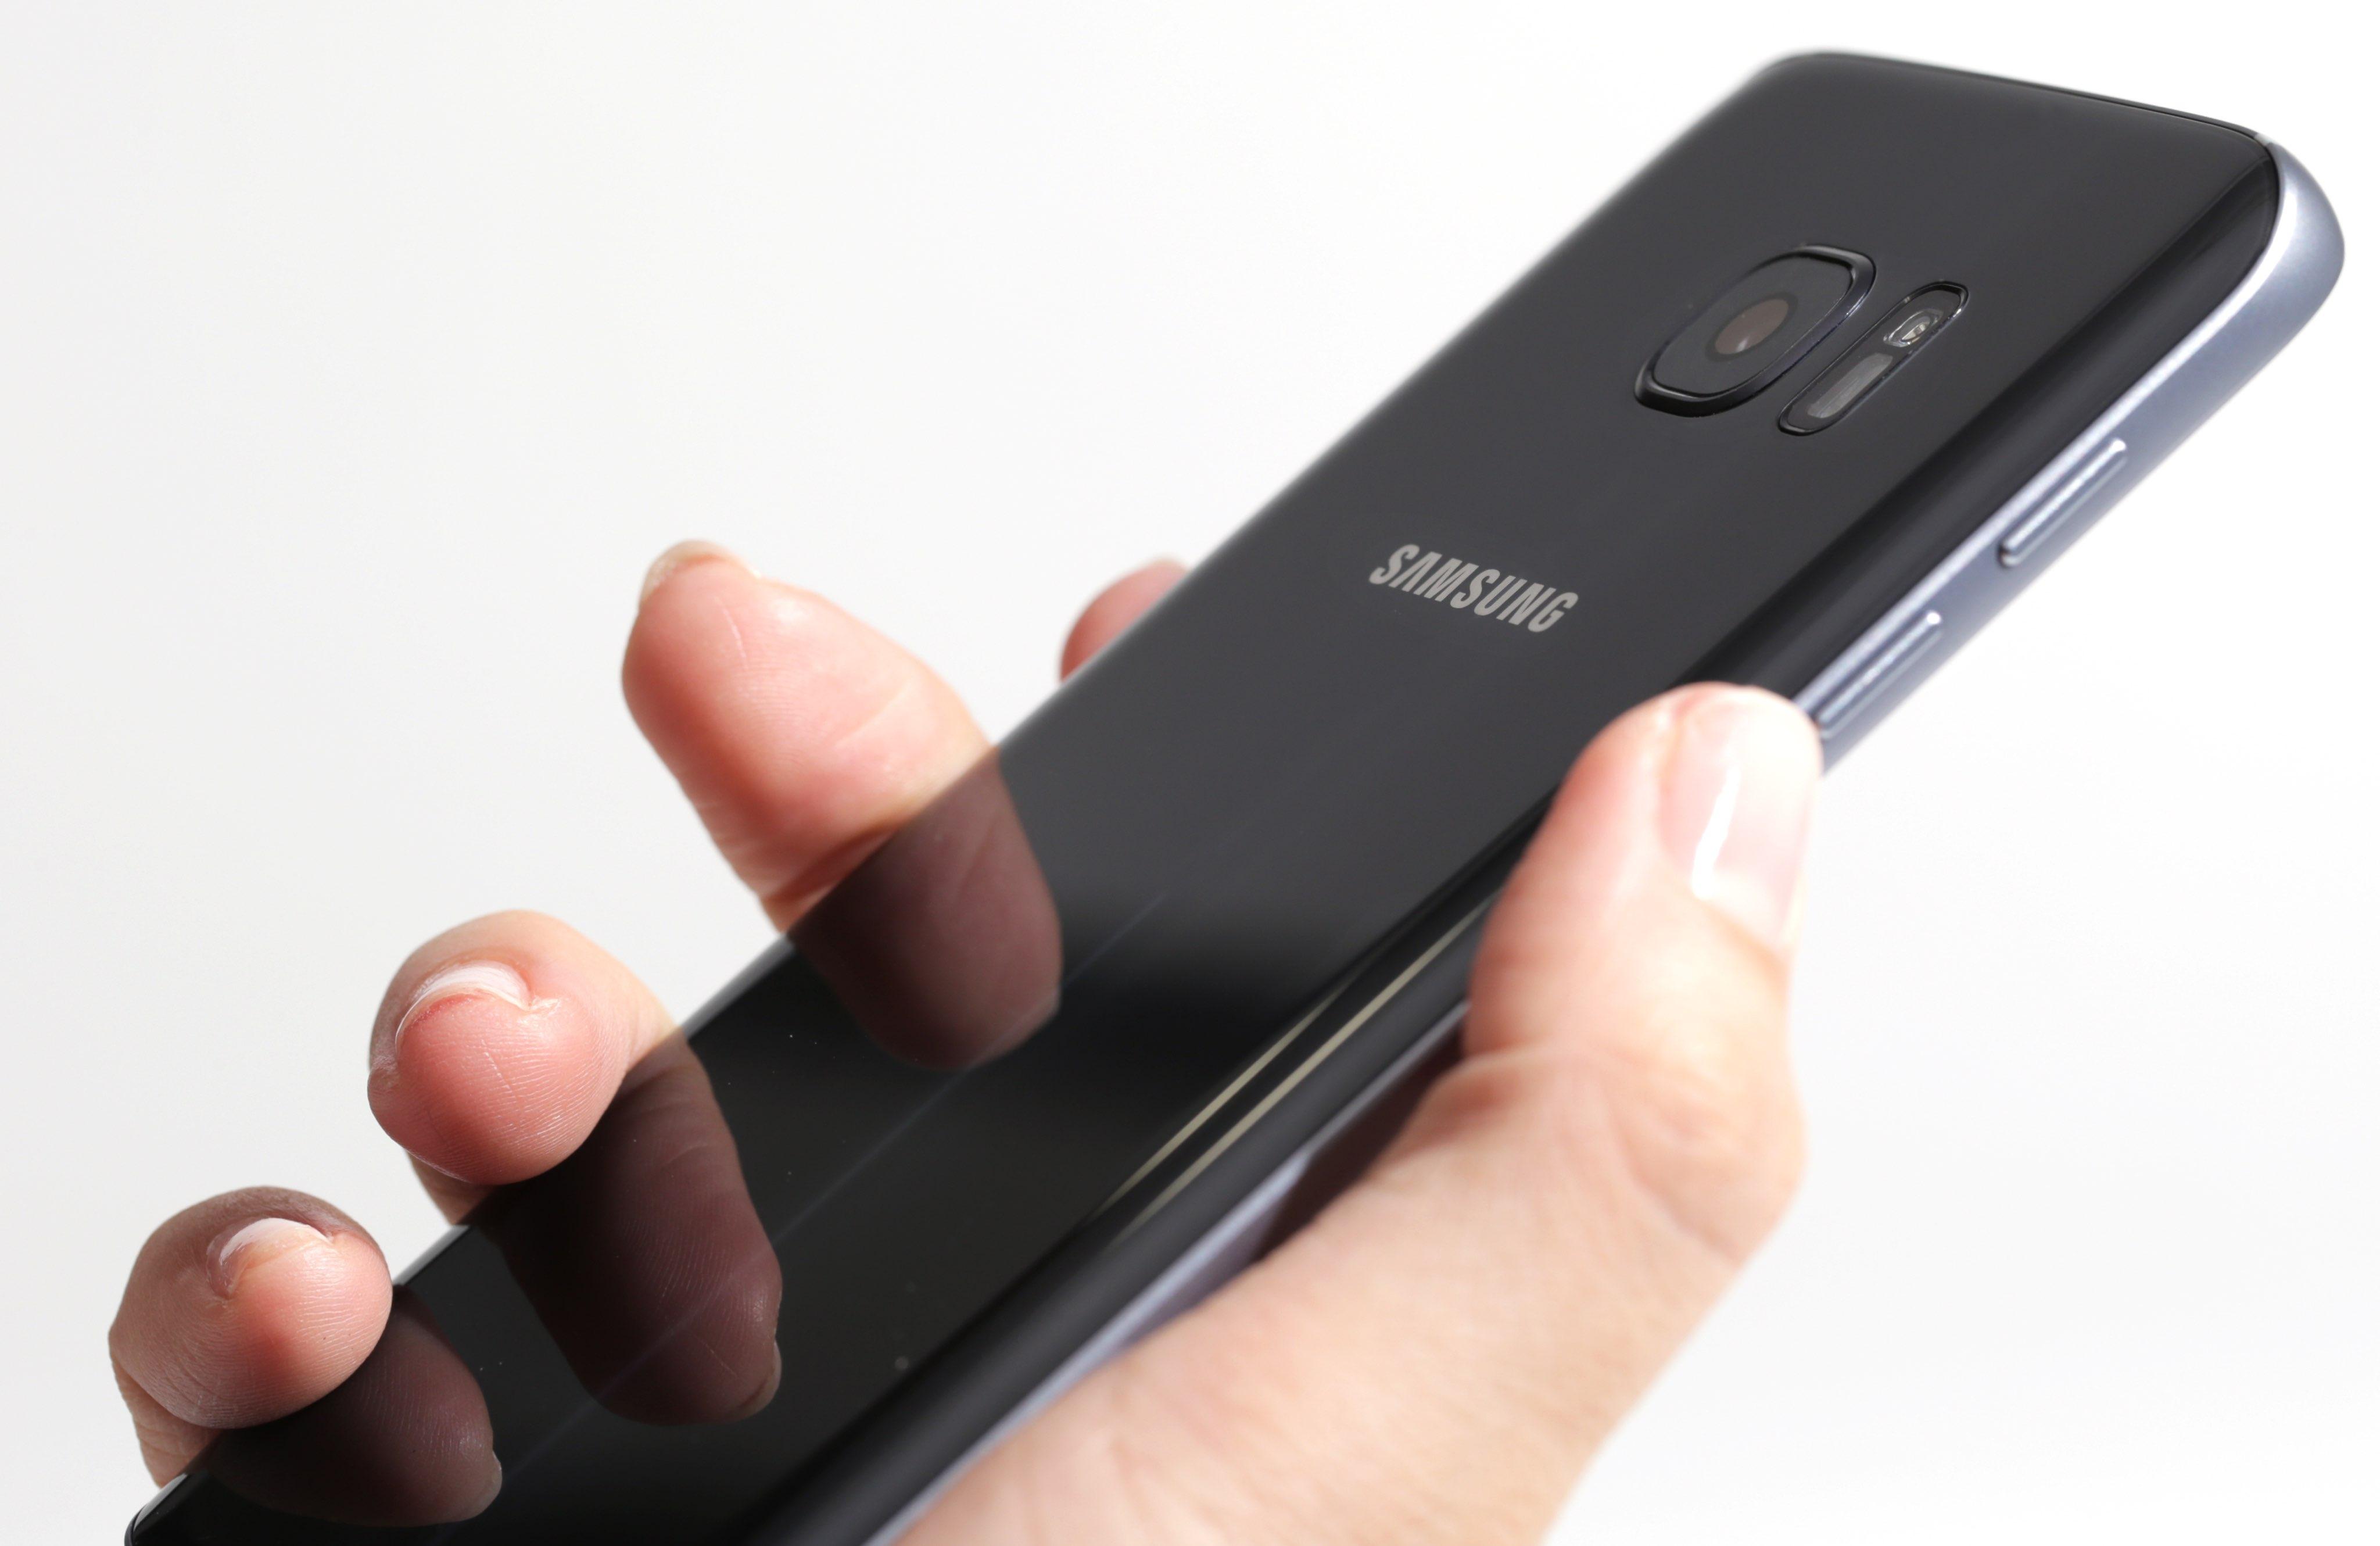 Samsung galaxy S7 Onyx black back image 001